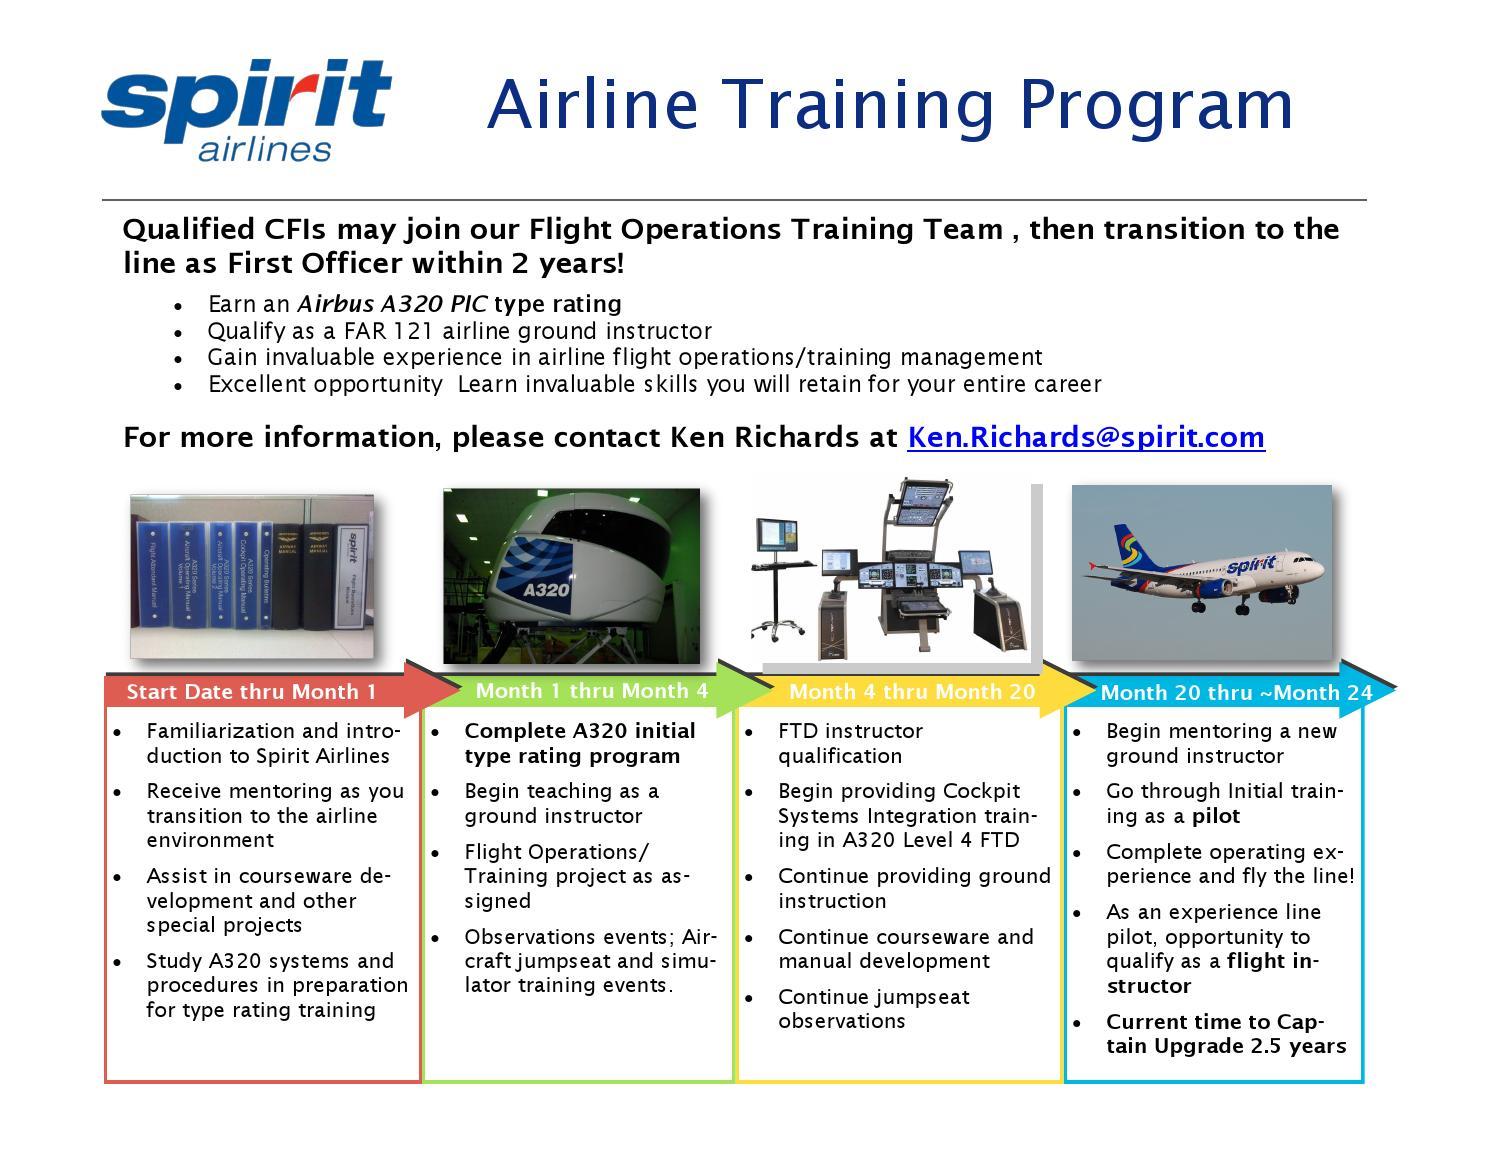 Spirit Airlines training program brochure(1) by ScottRehn